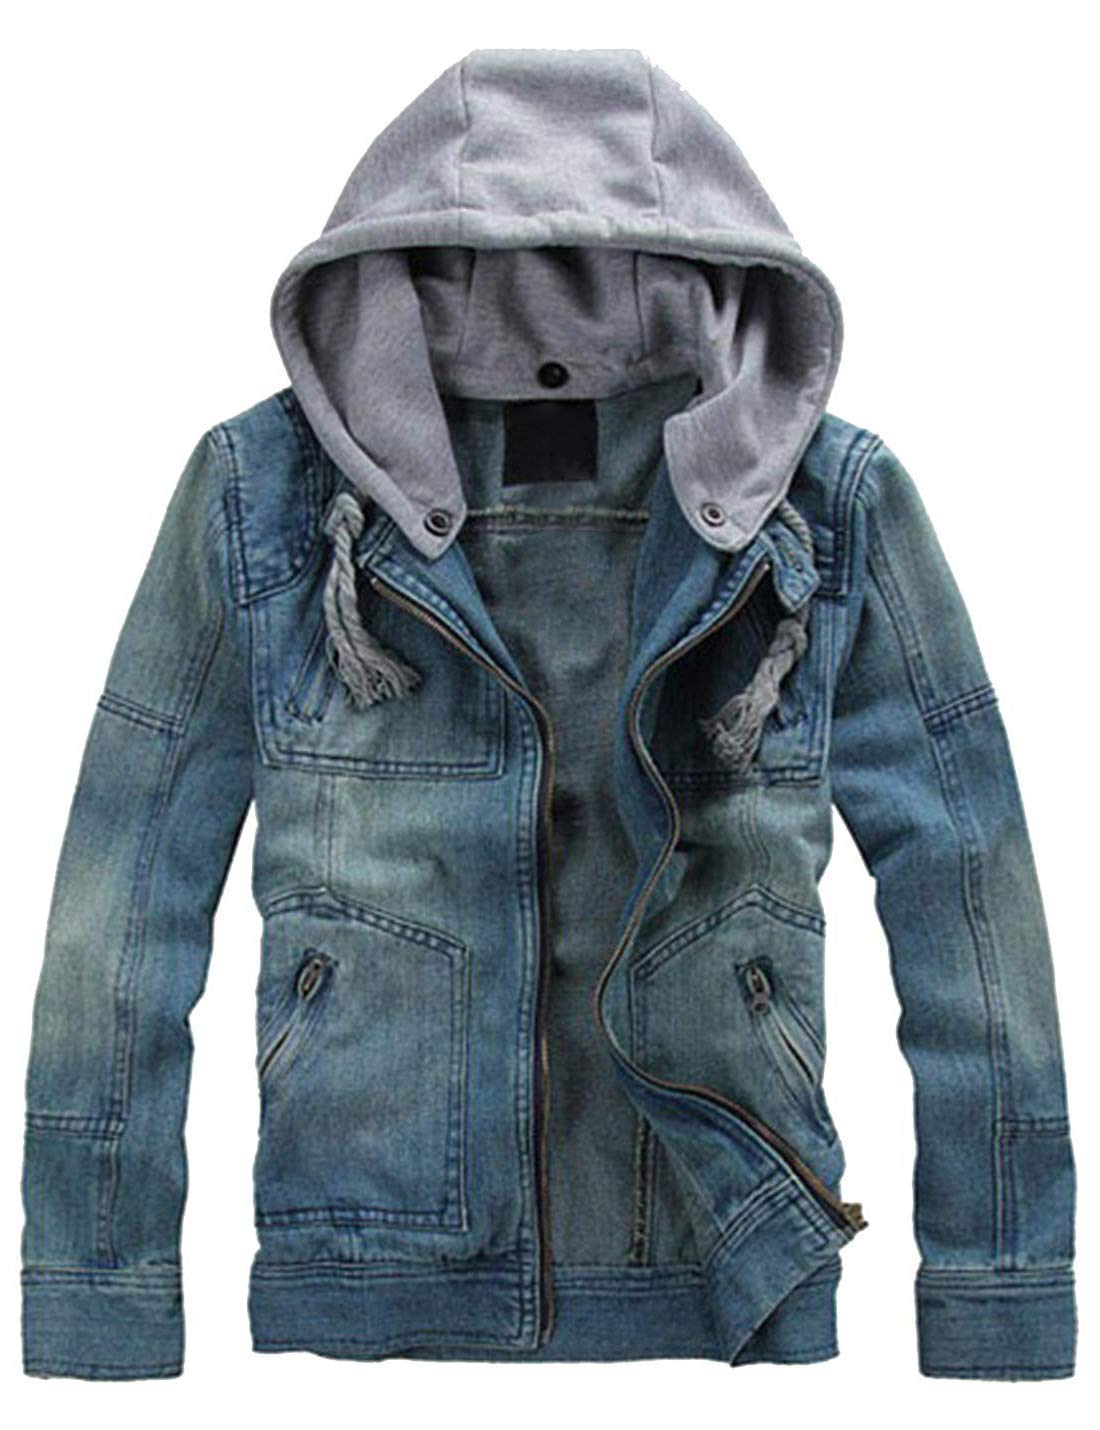 Lentta Men's Slim Fit Zip Up Removable Hooded Drawstring Denim Jean Biker Jacket (Medium, Blue005) by Lentta